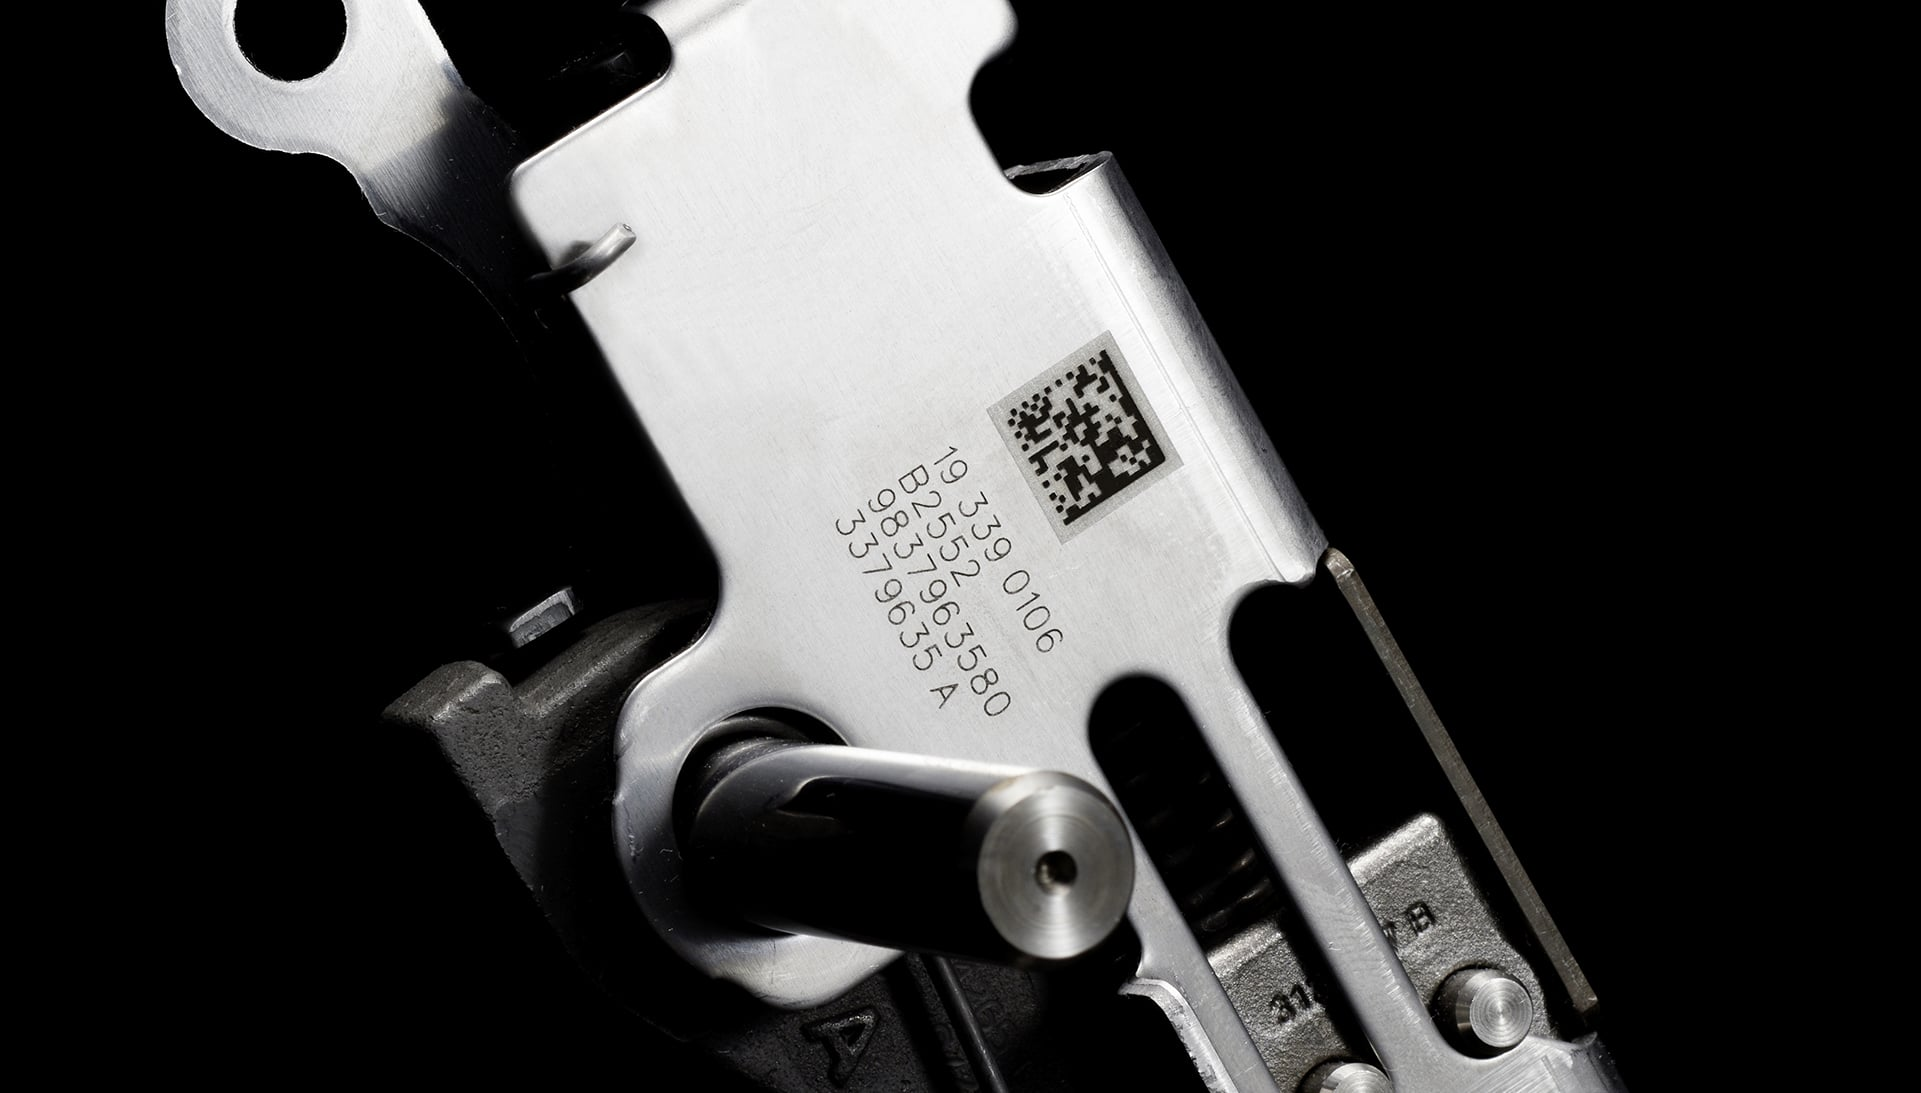 Marquage Datamatrix laser-pièce automobile